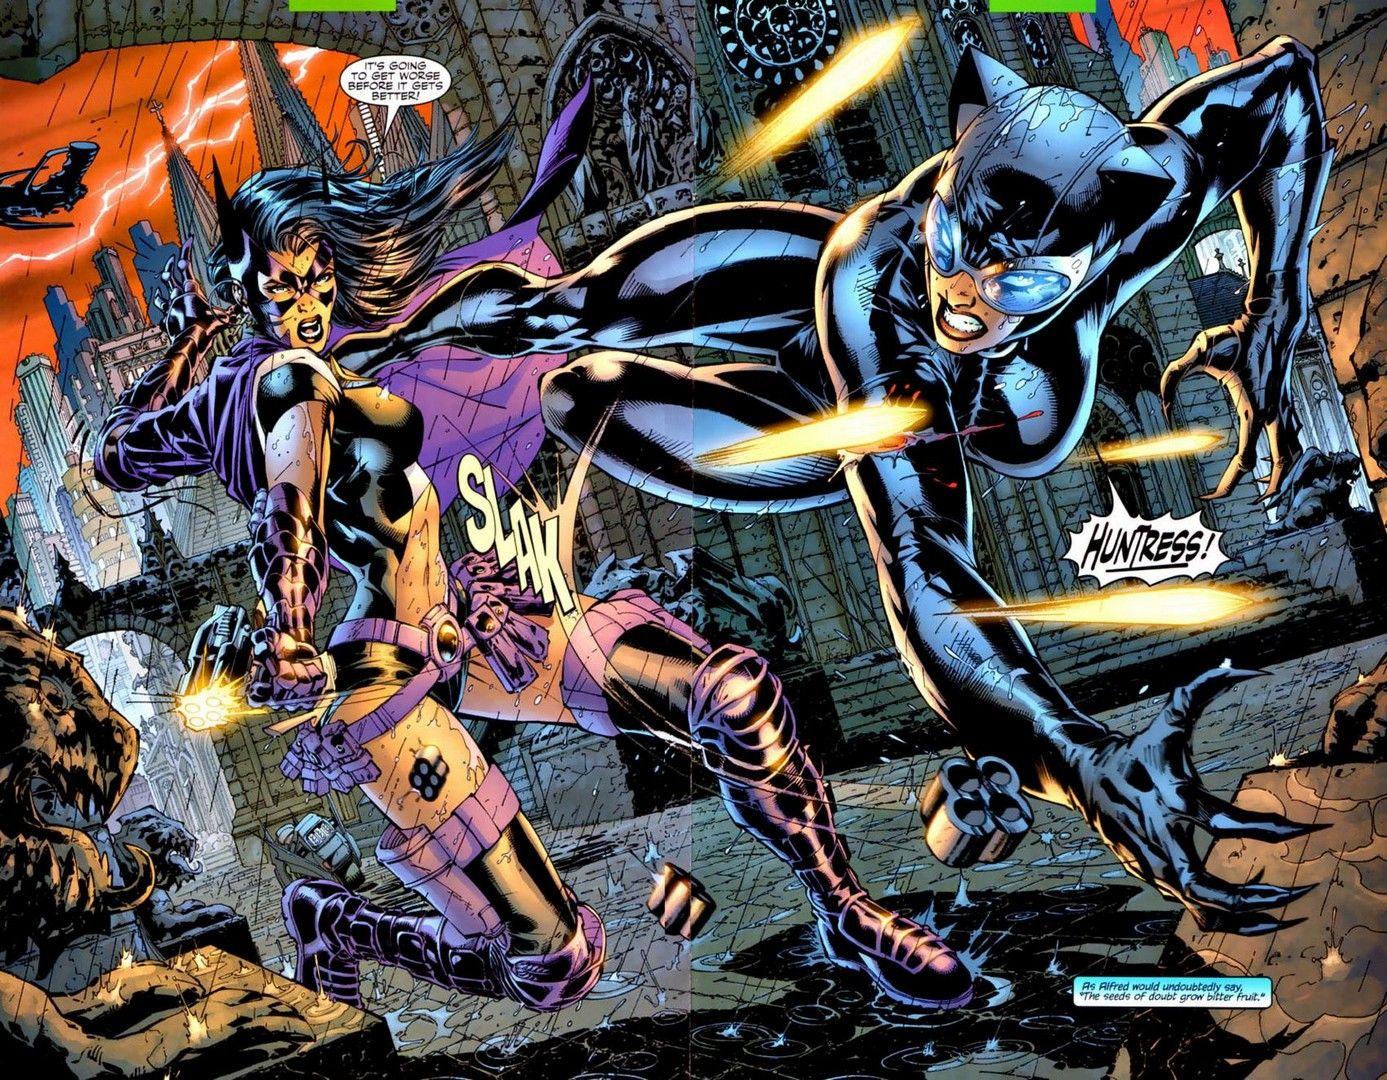 Huntress Wallpaper Batman Hush Huntress Batman And Catwoman